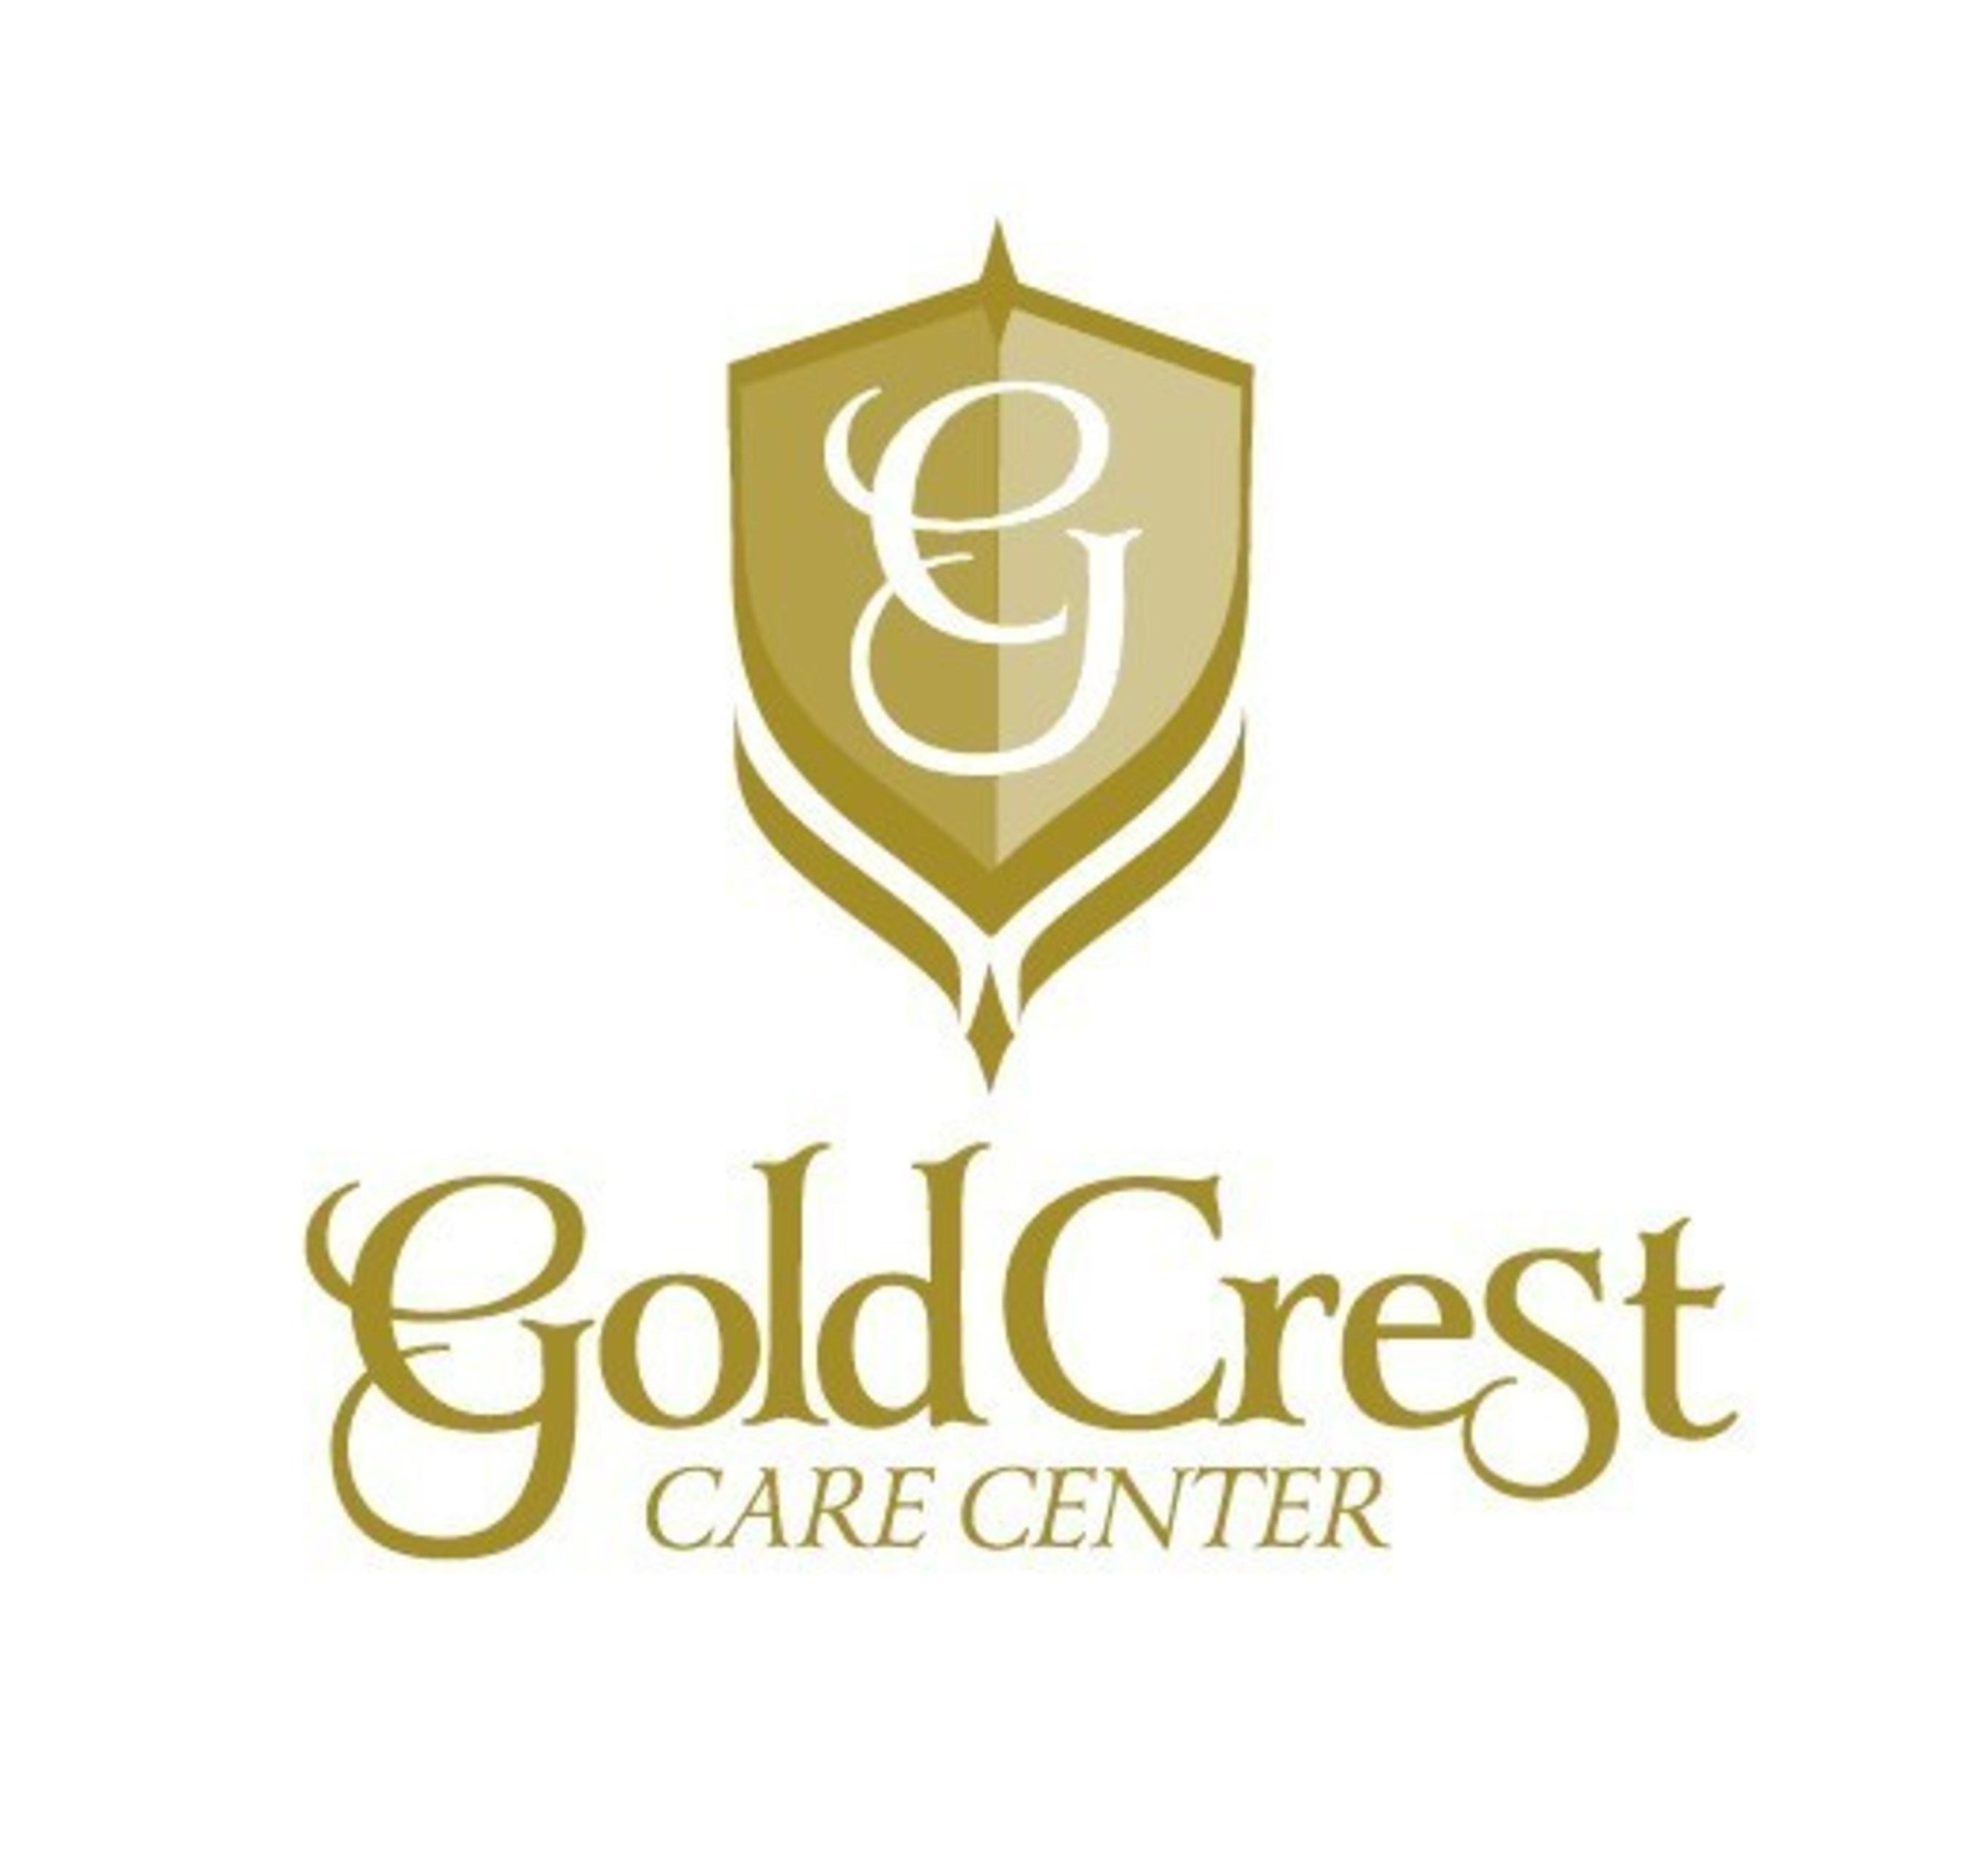 Bronx Nursing Home, Gold Crest Care Center, Explains The